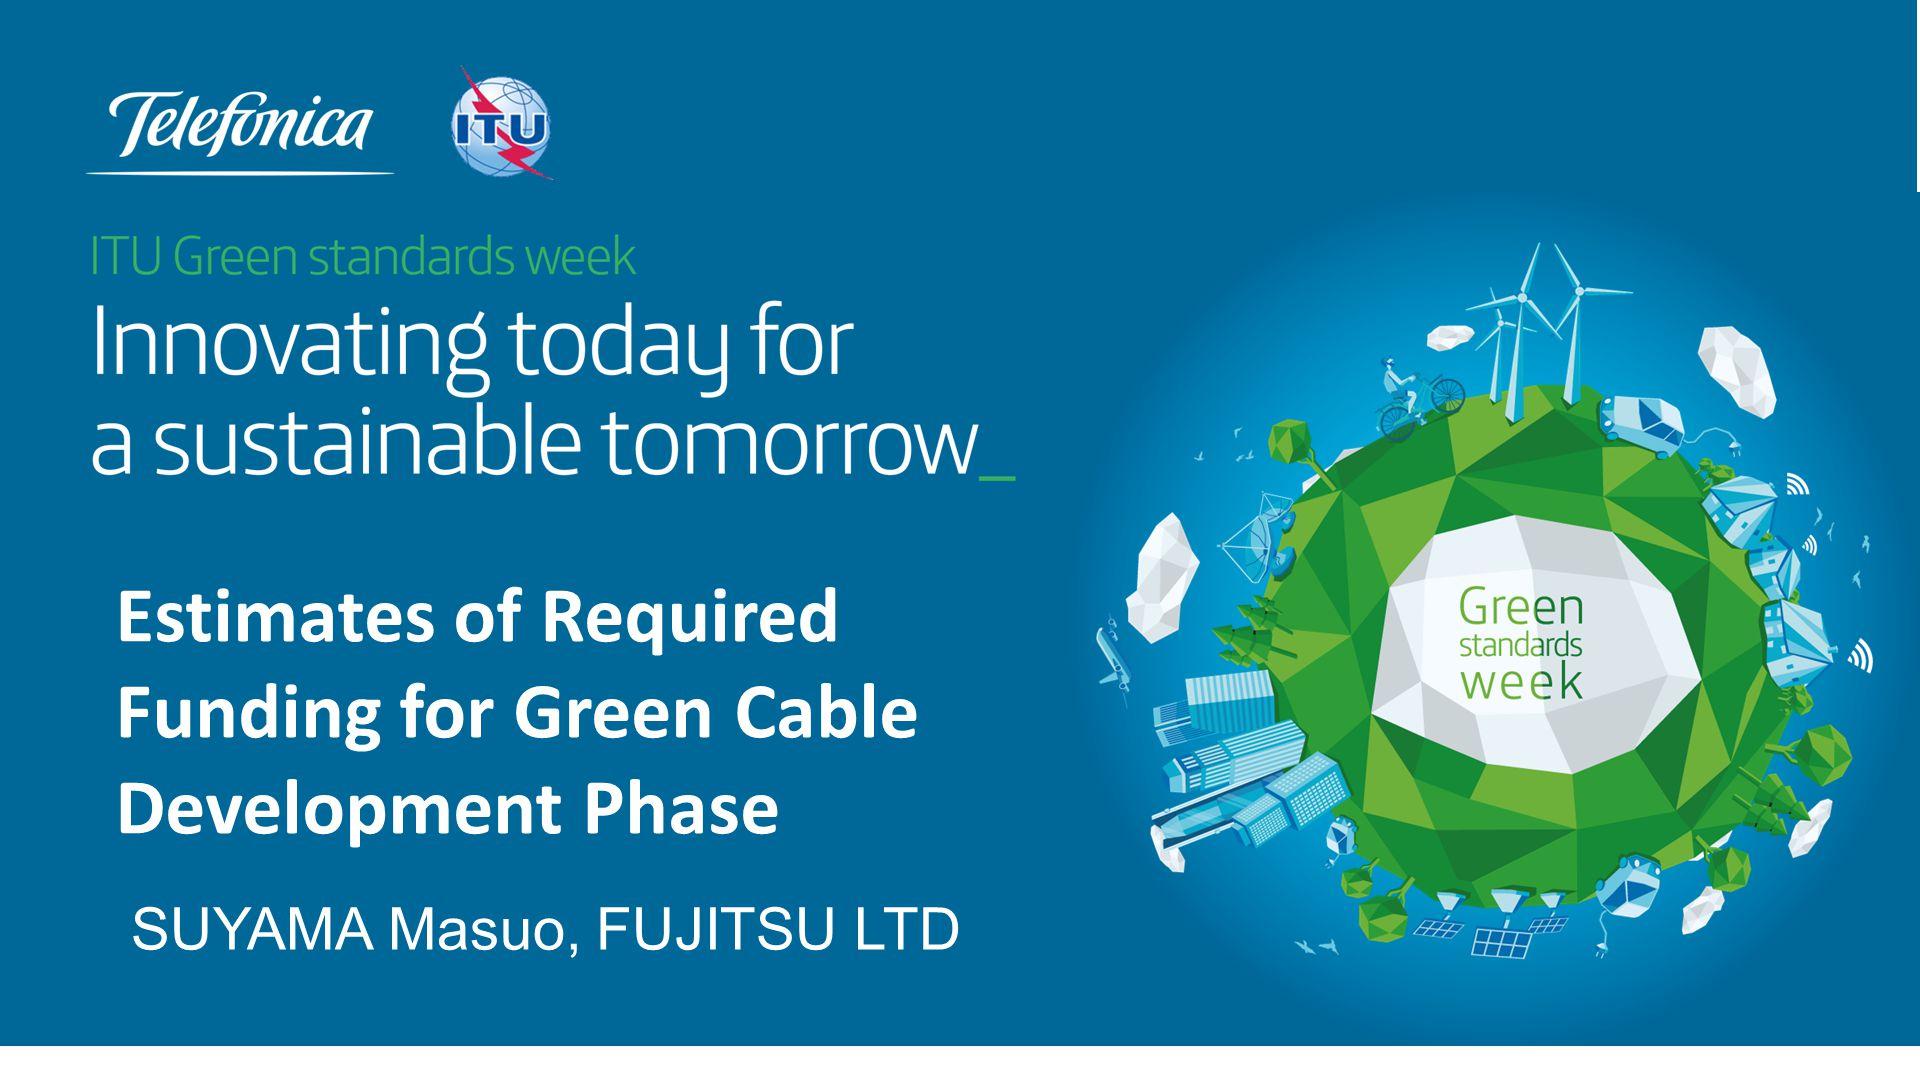 SUYAMA Masuo, FUJITSU LTD Estimates of Required Funding for Green Cable Development Phase